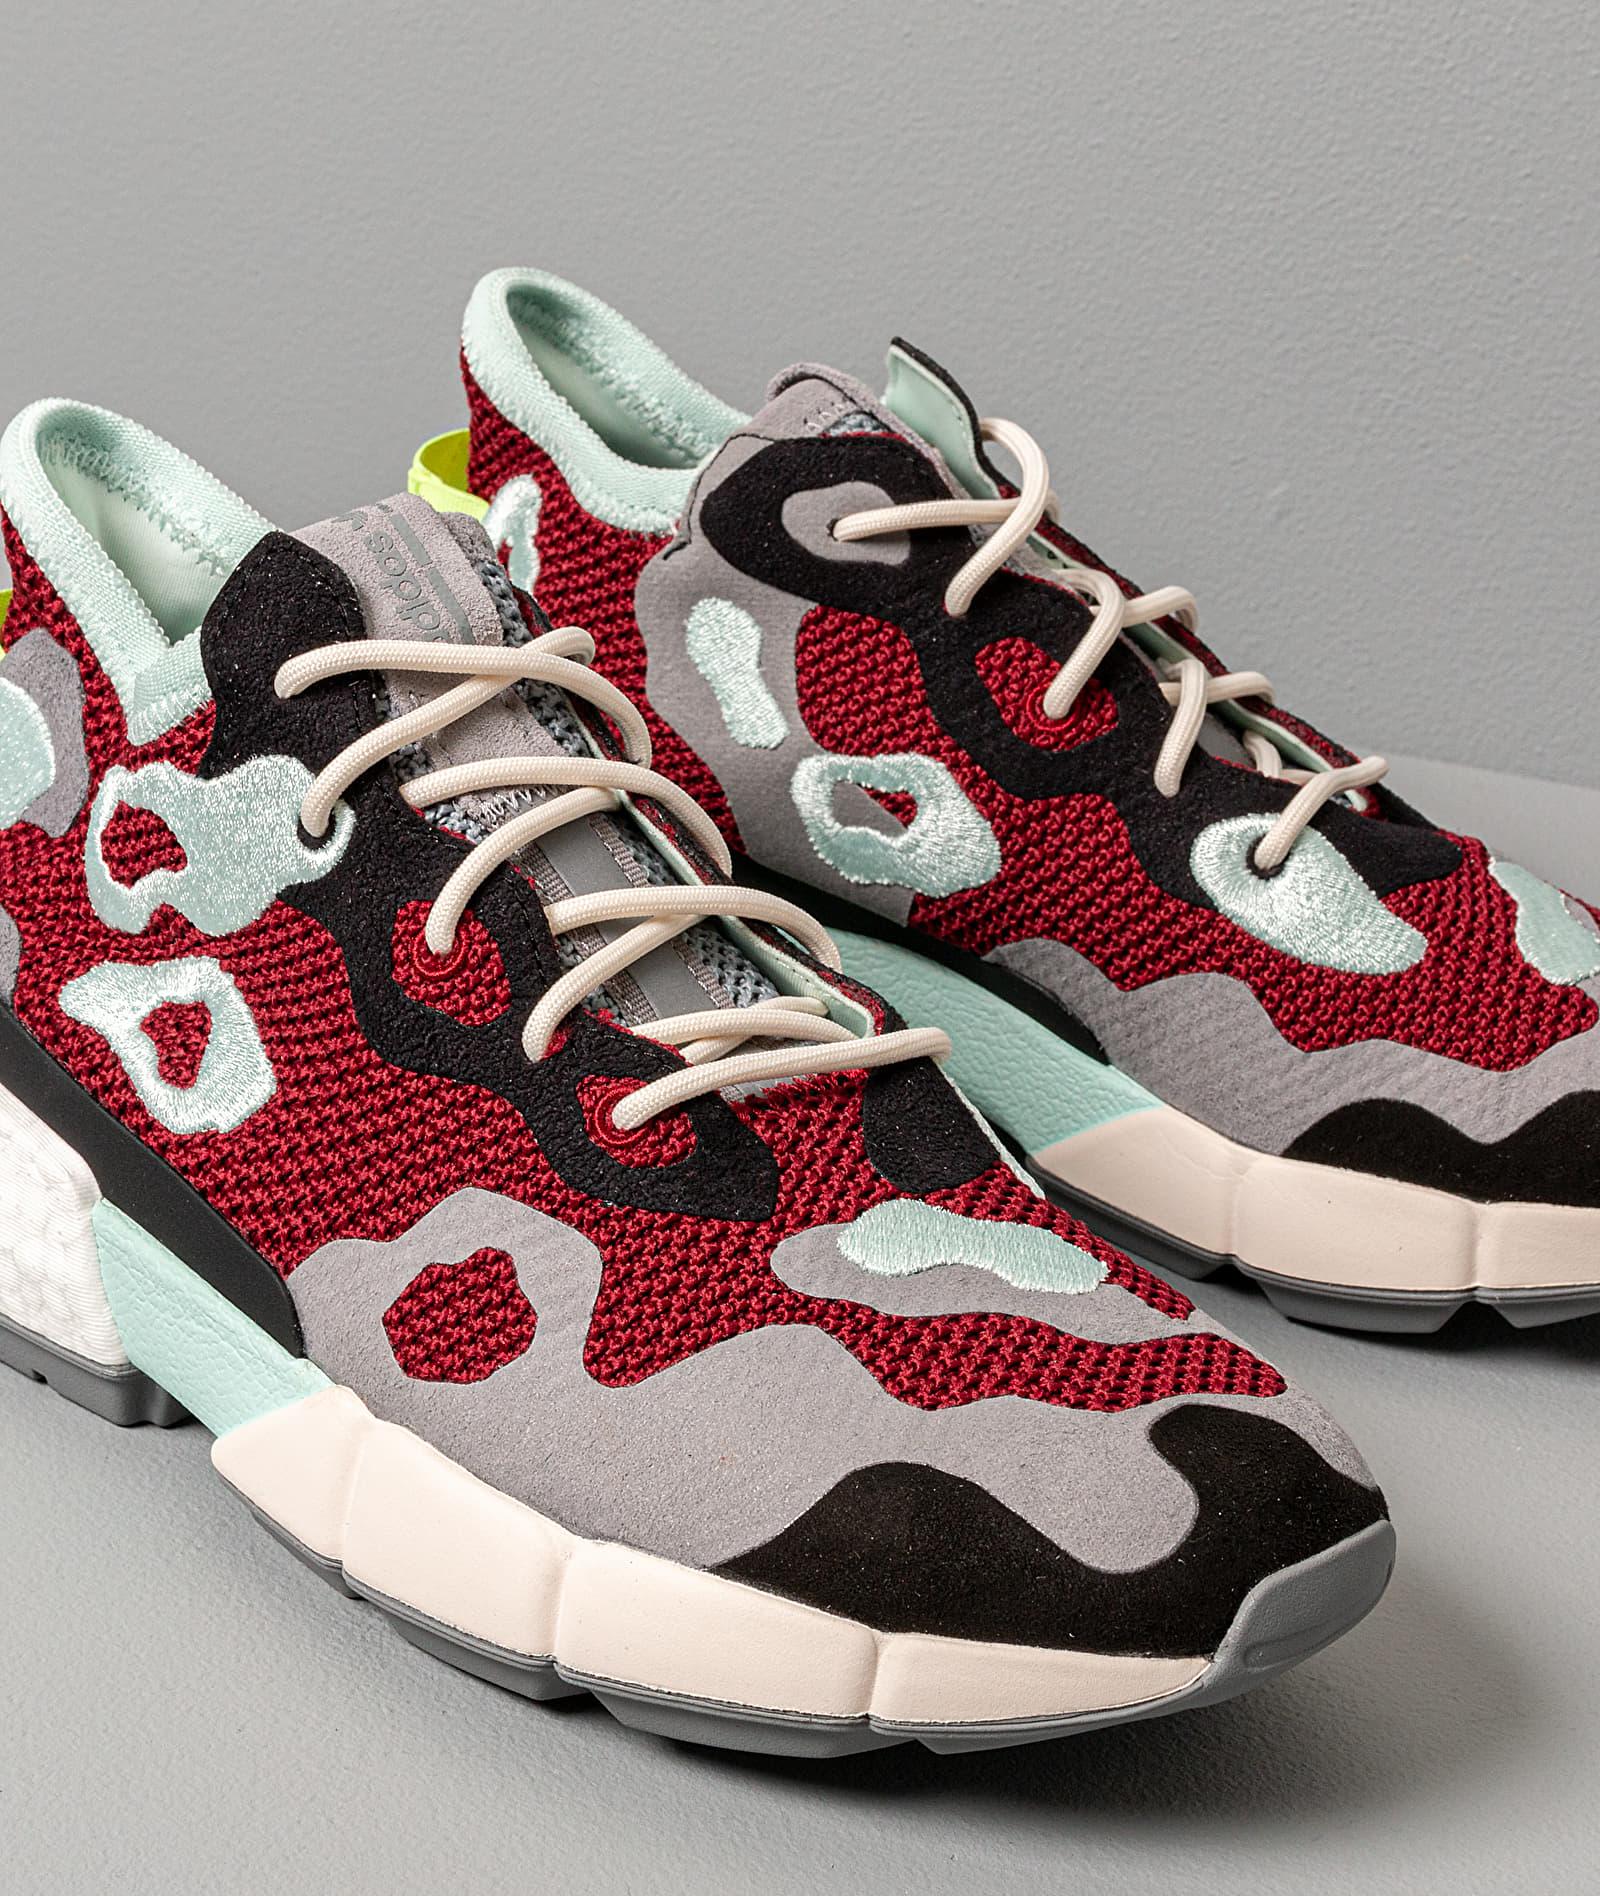 adidas Pod-S3.2 Ml Core Burgundy/ Grey Three/ Ice Mint, Red